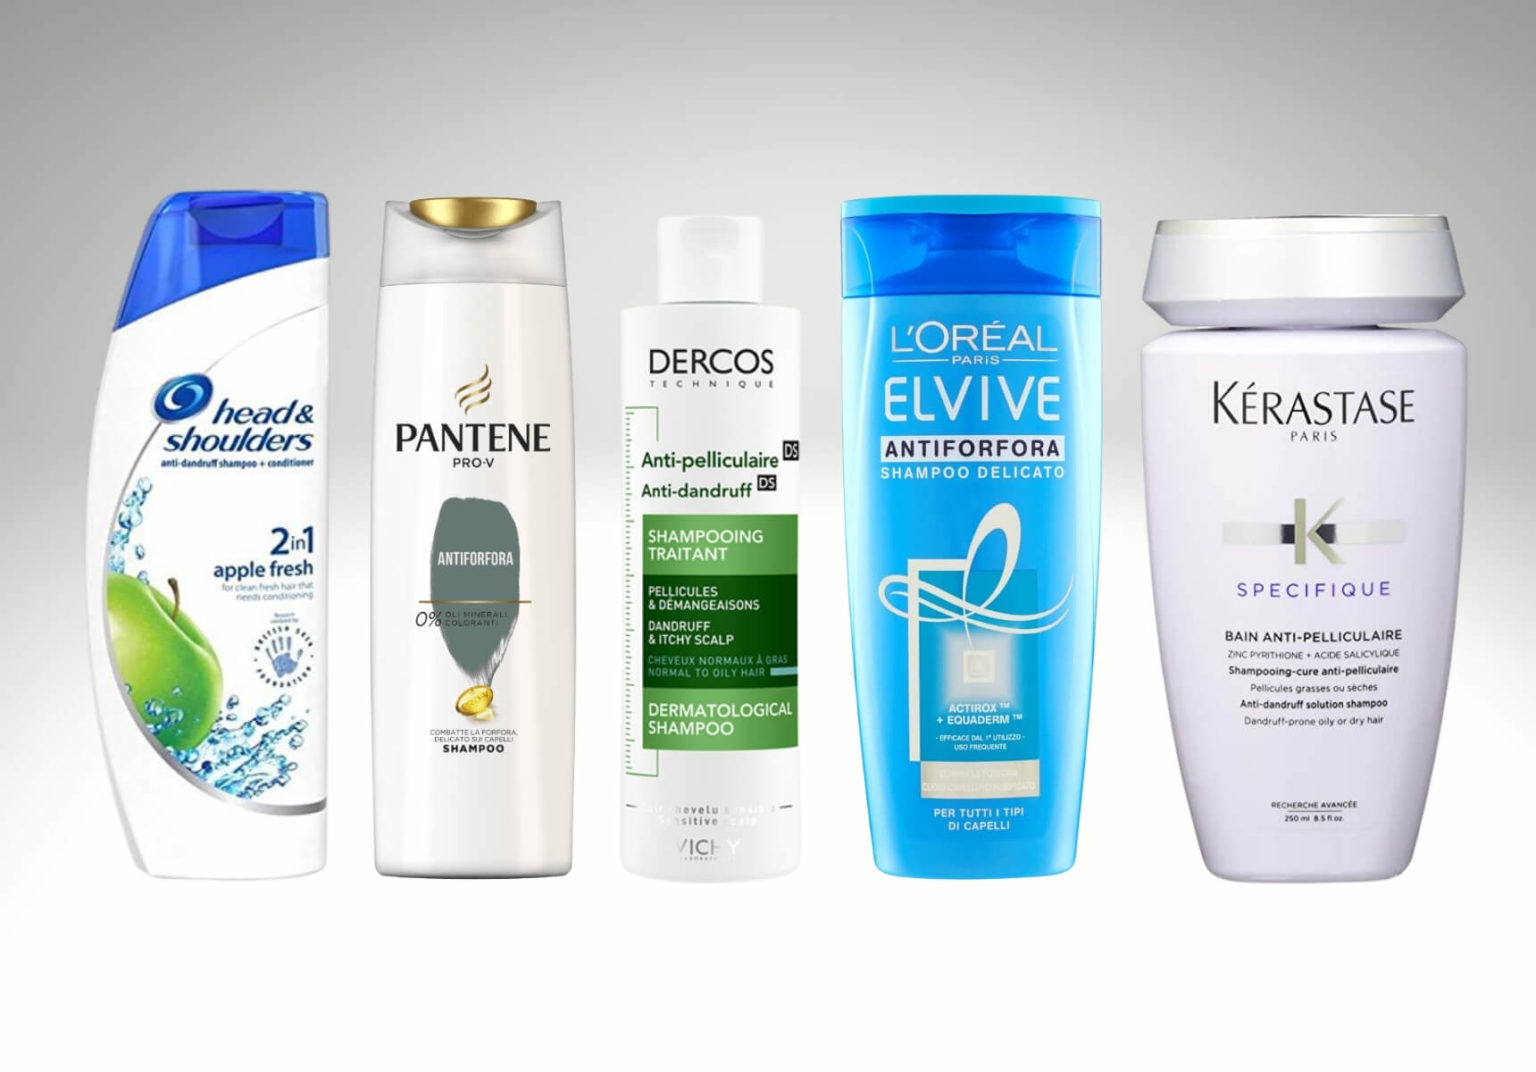 miglior-shampoo-antiforfora